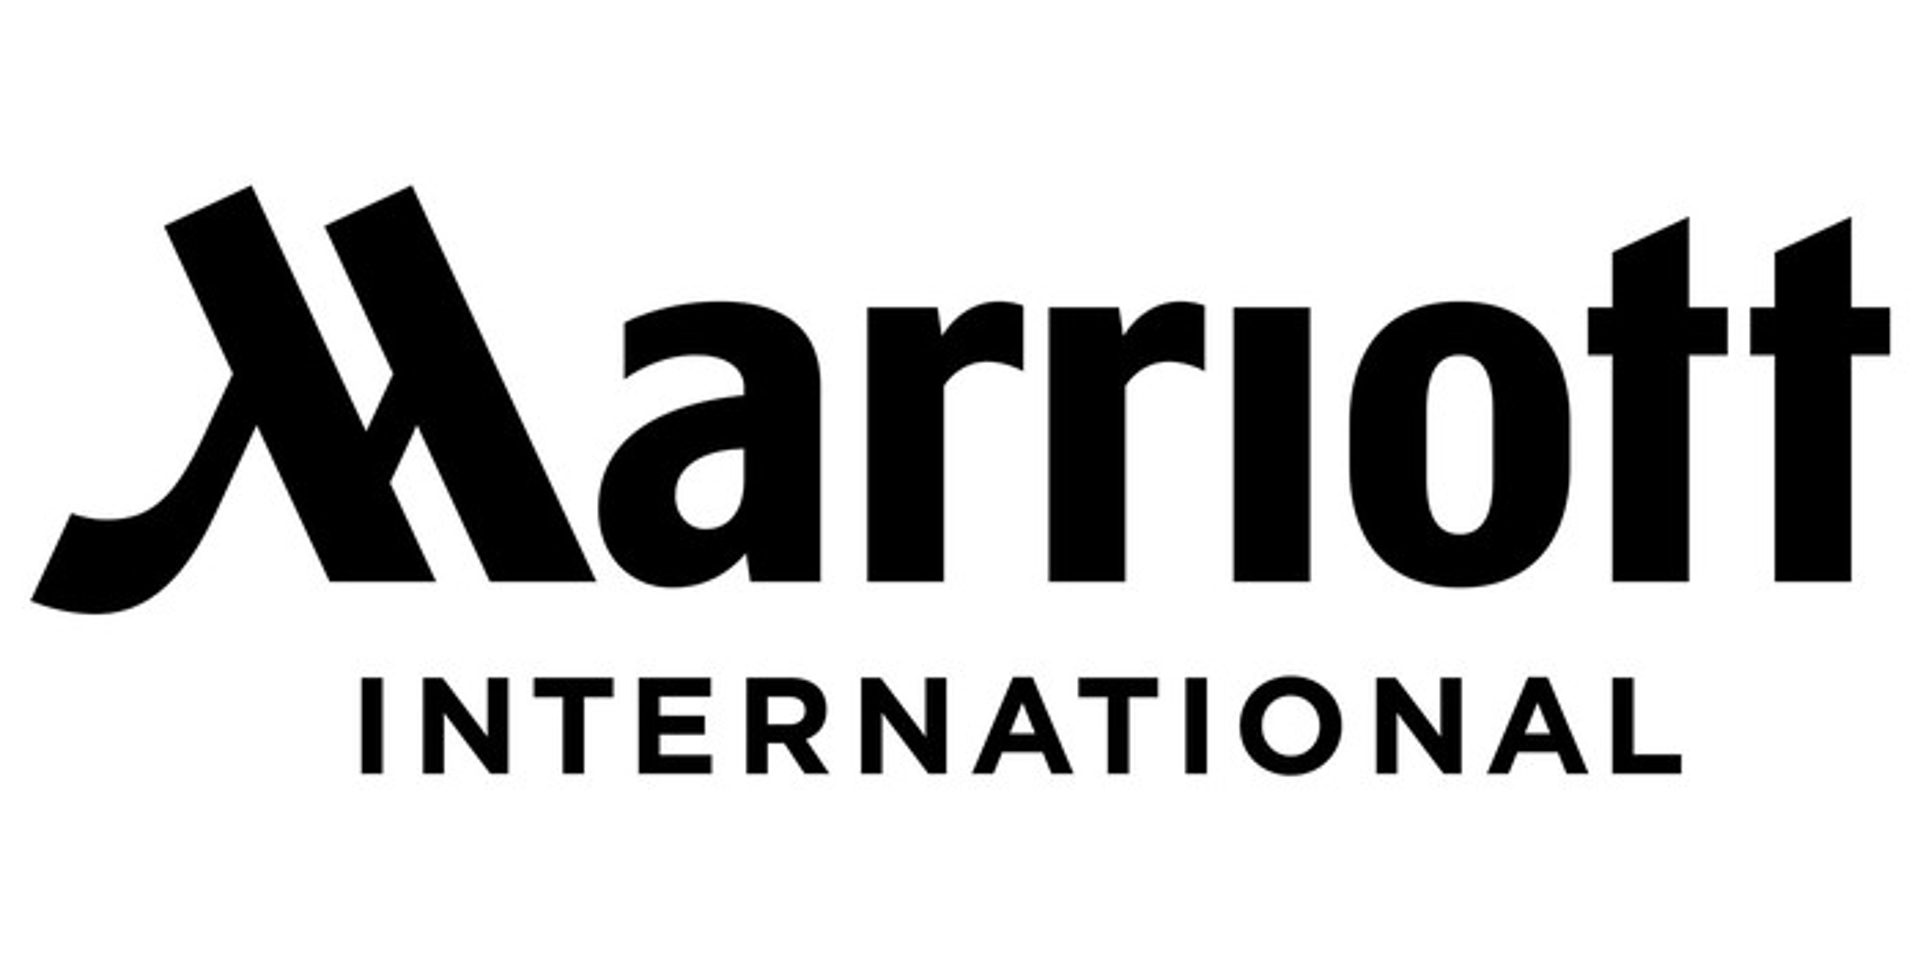 Marriott logo in black.